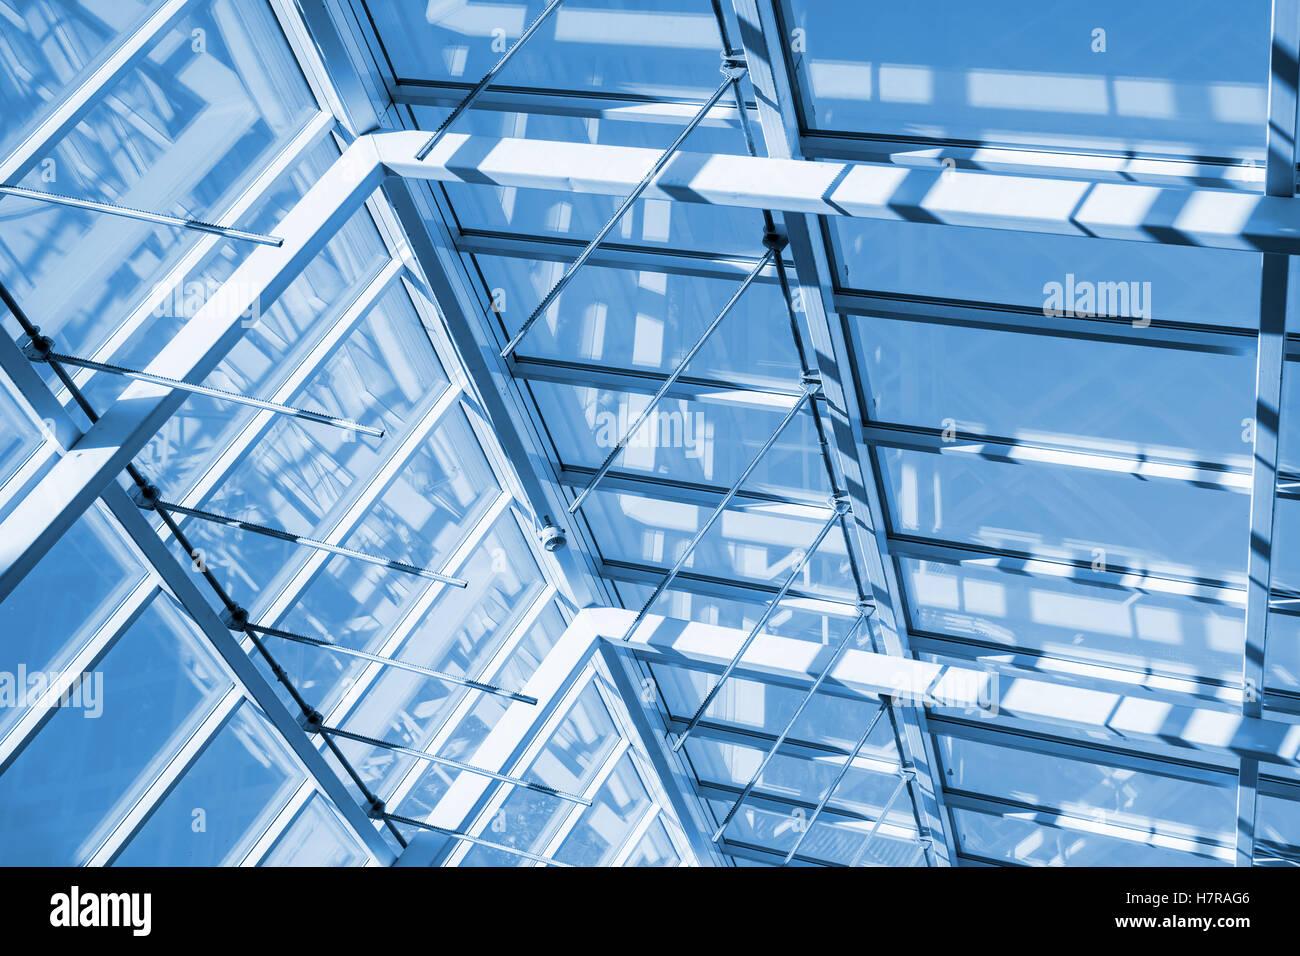 Resumen La Arquitectura High Tech Contemporáneo Antecedentes